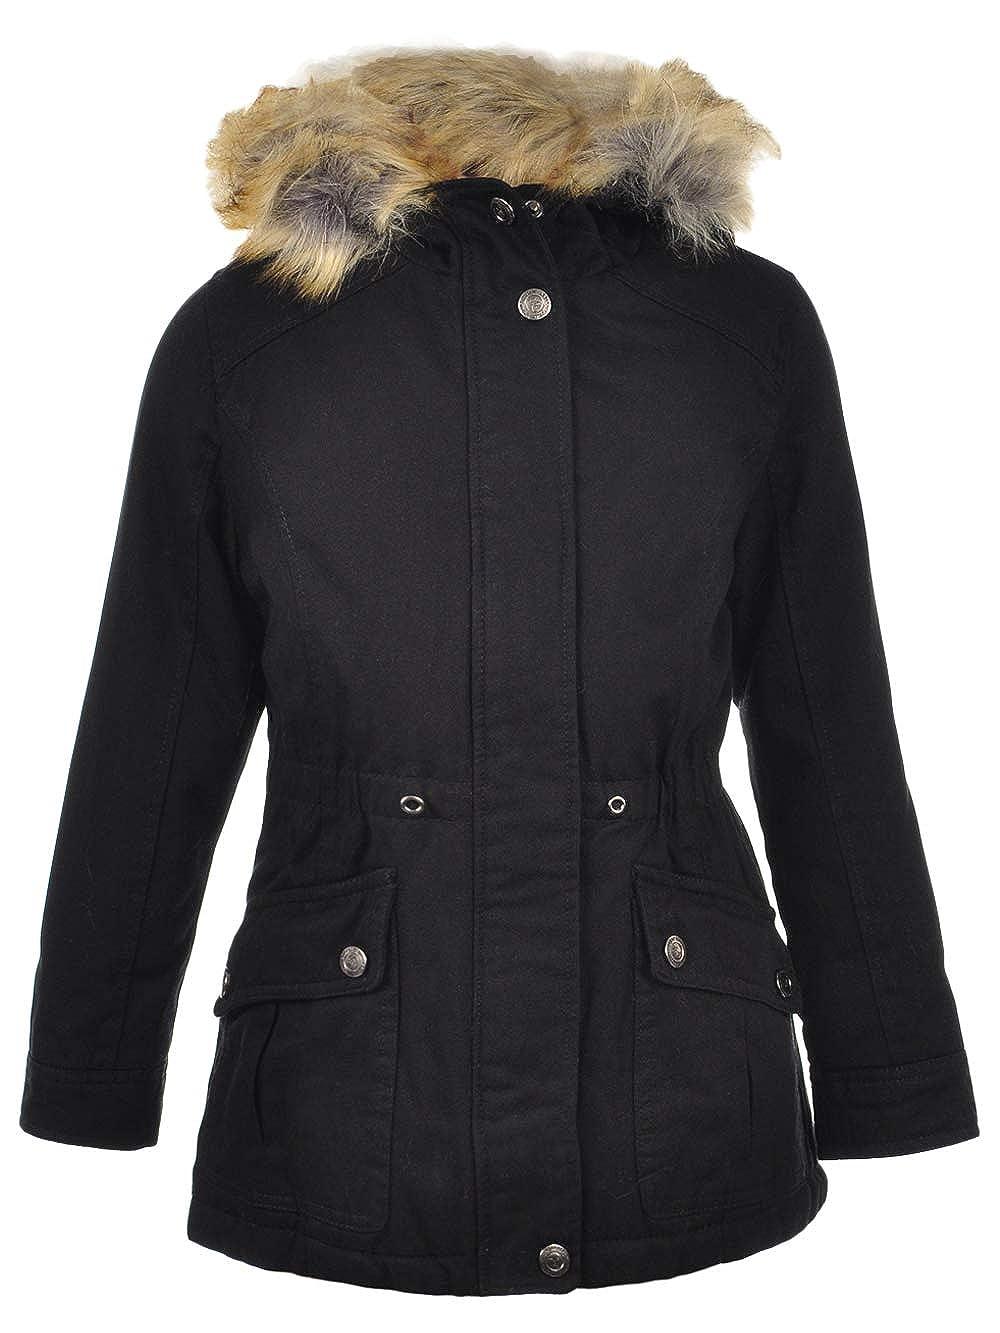 Urban Republic Girls' Hooded Jacket